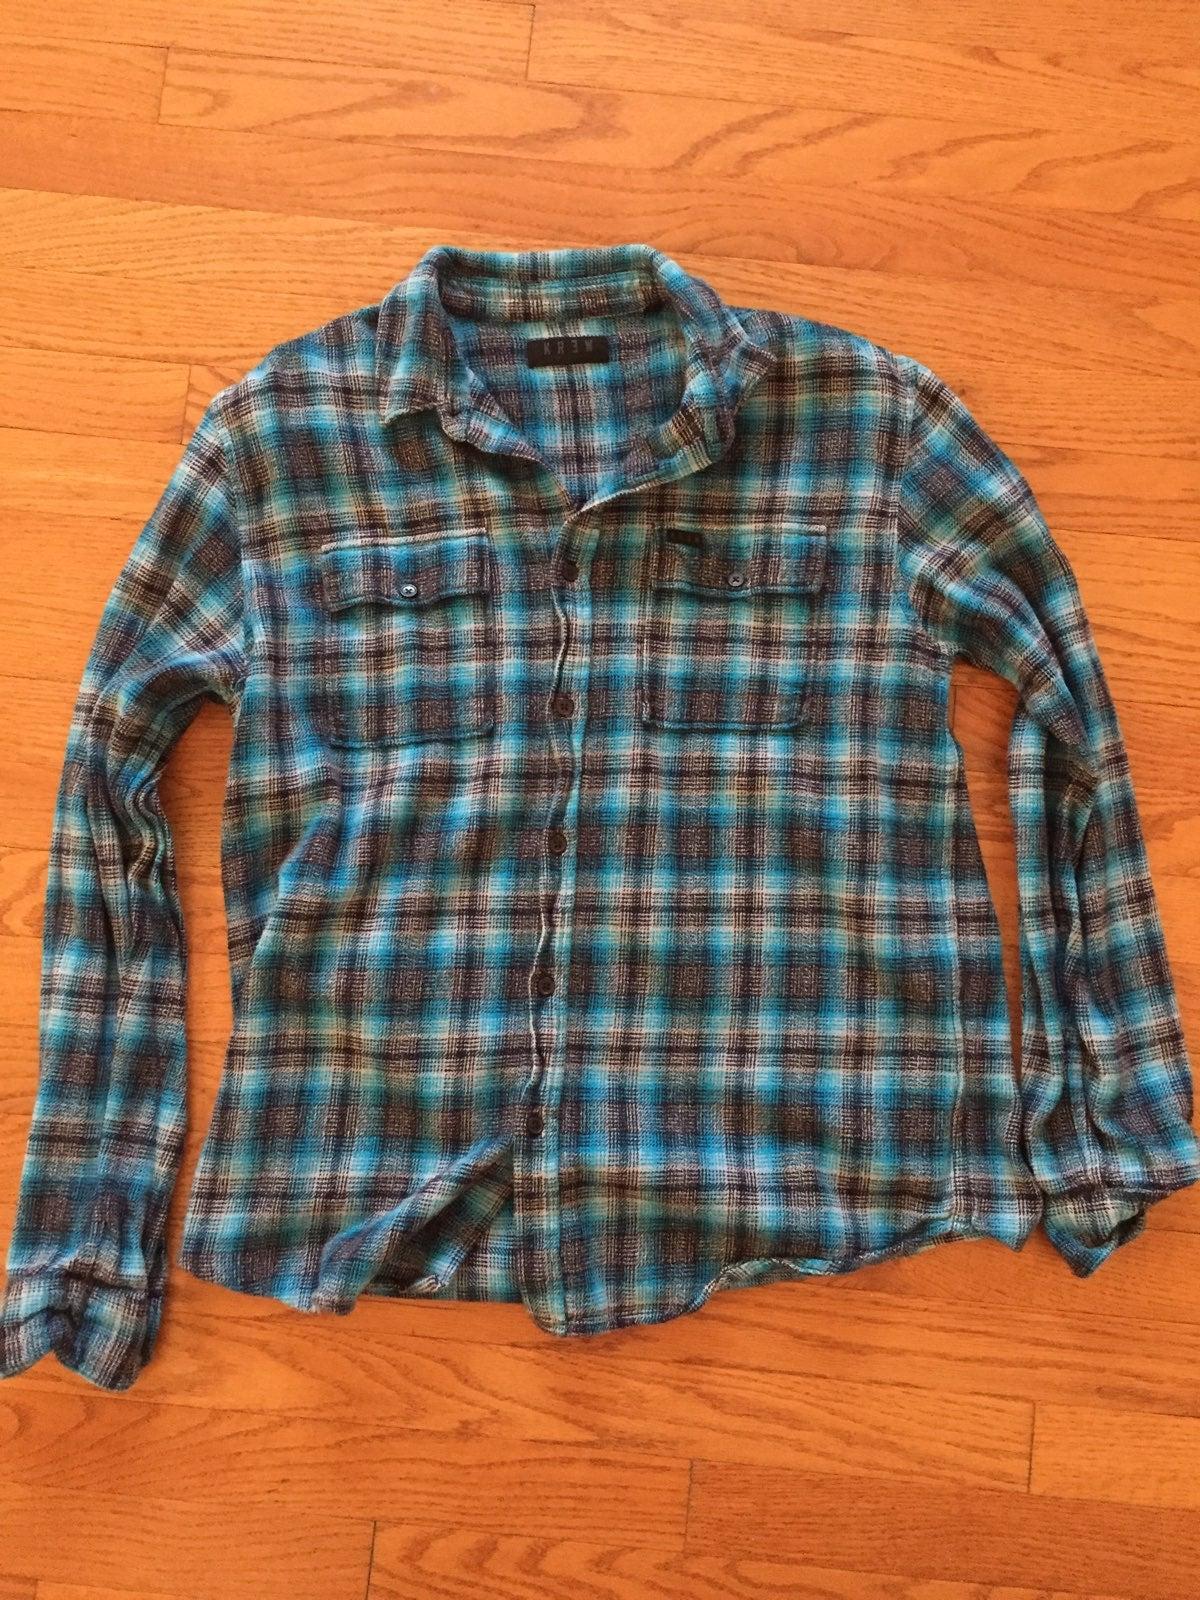 Krew Flannel Shirt